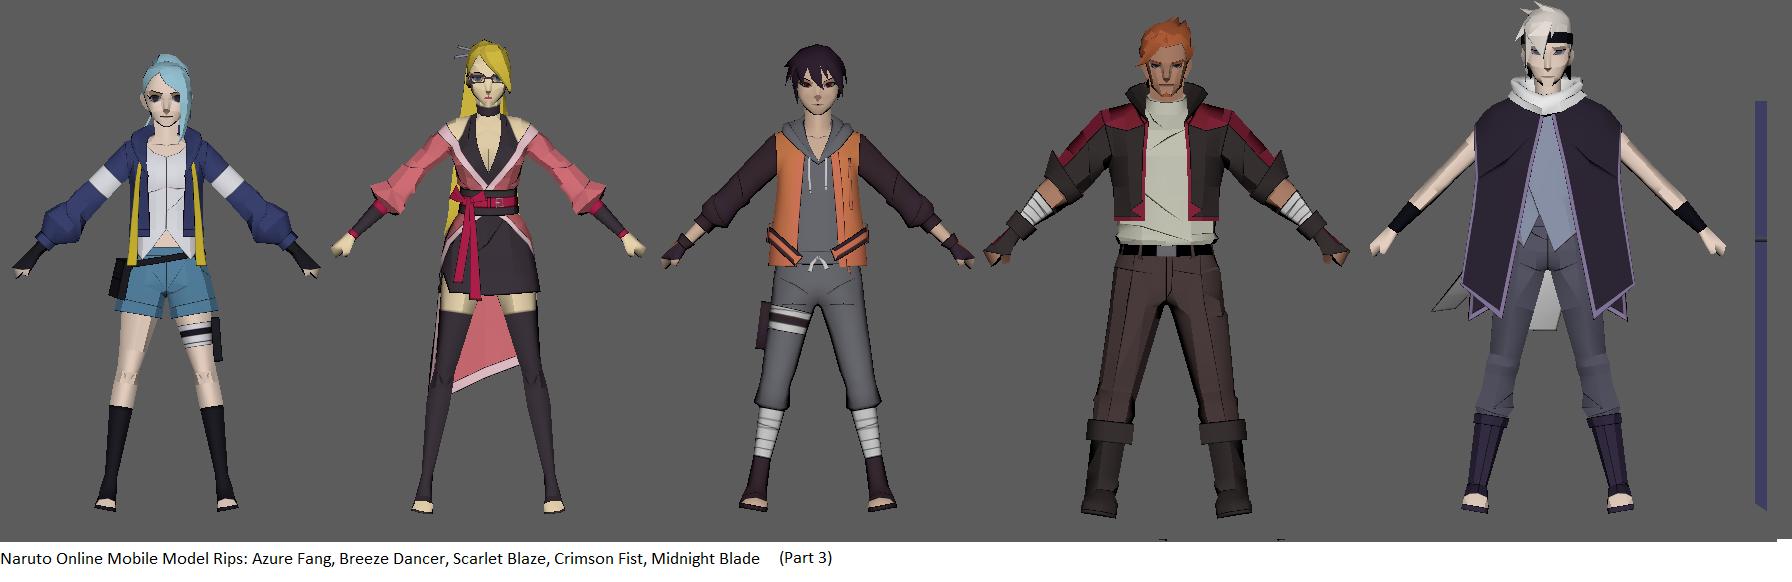 Naruto Online Avatars (Part 3) - Static by ChakraWarrior2012